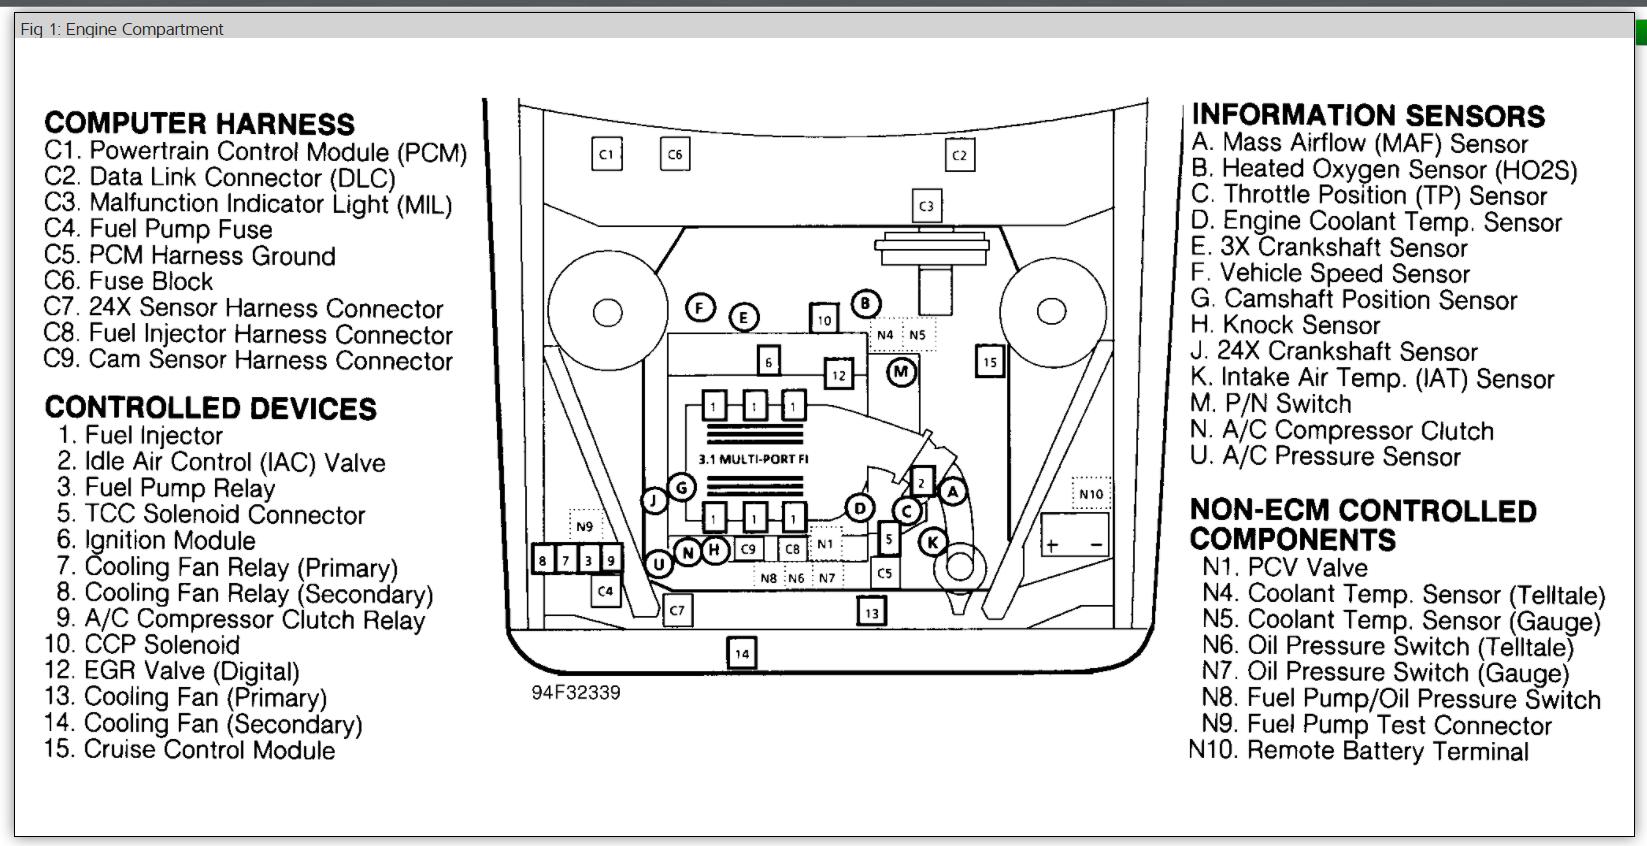 96 Buick Ac Wiring Diagram Wiring Diagram For Trailer Lights 6 Way For Wiring Diagram Schematics